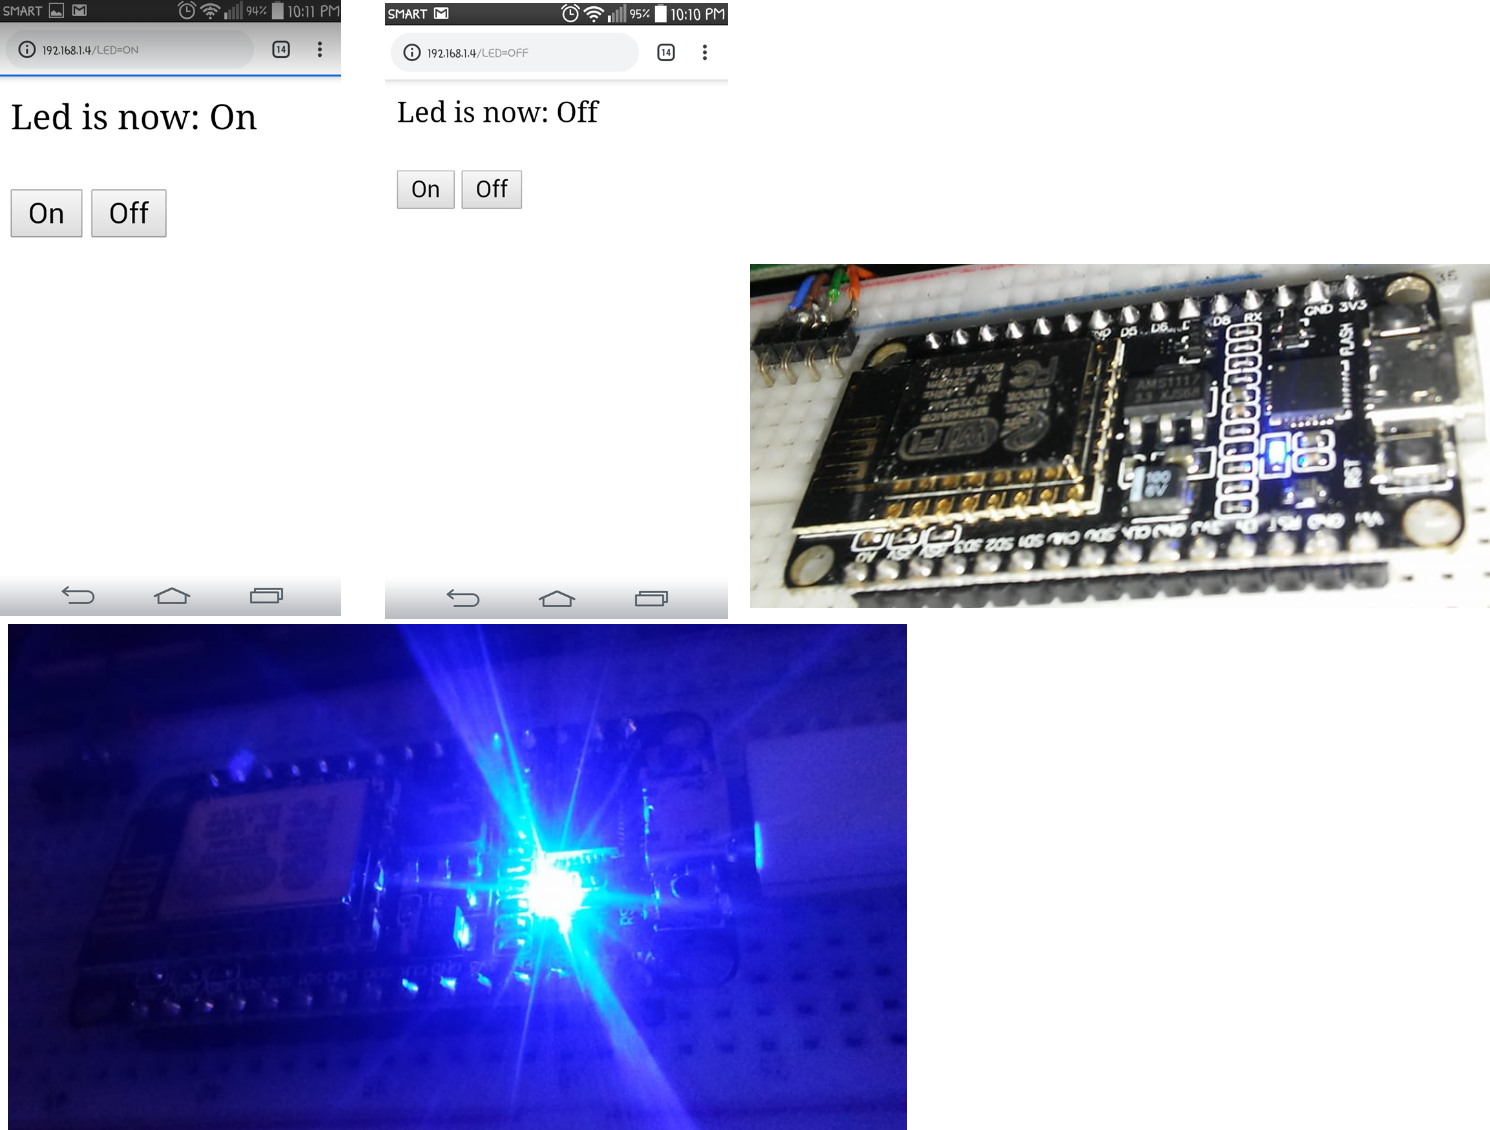 Internet Controlled LED Using NodeMCU